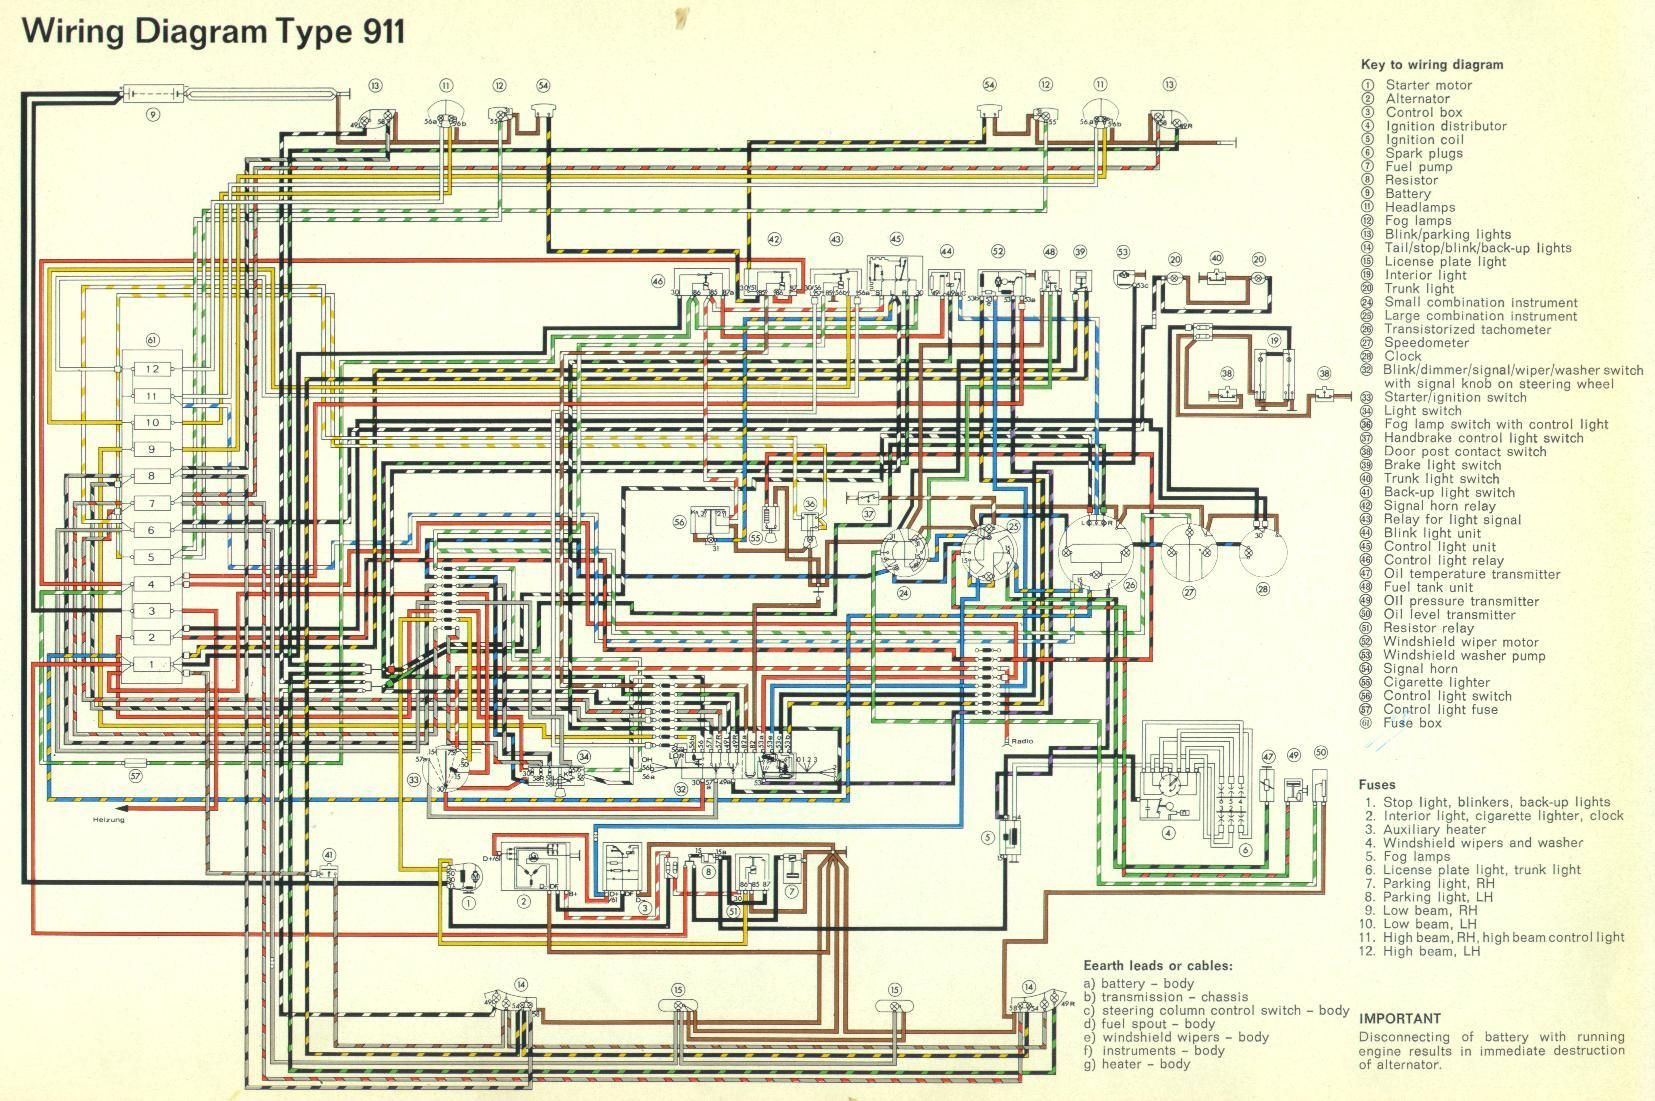 porsche 928 wiring diagram - wiring diagram schema loose-head -  loose-head.atmosphereconcept.it  atmosphereconcept.it